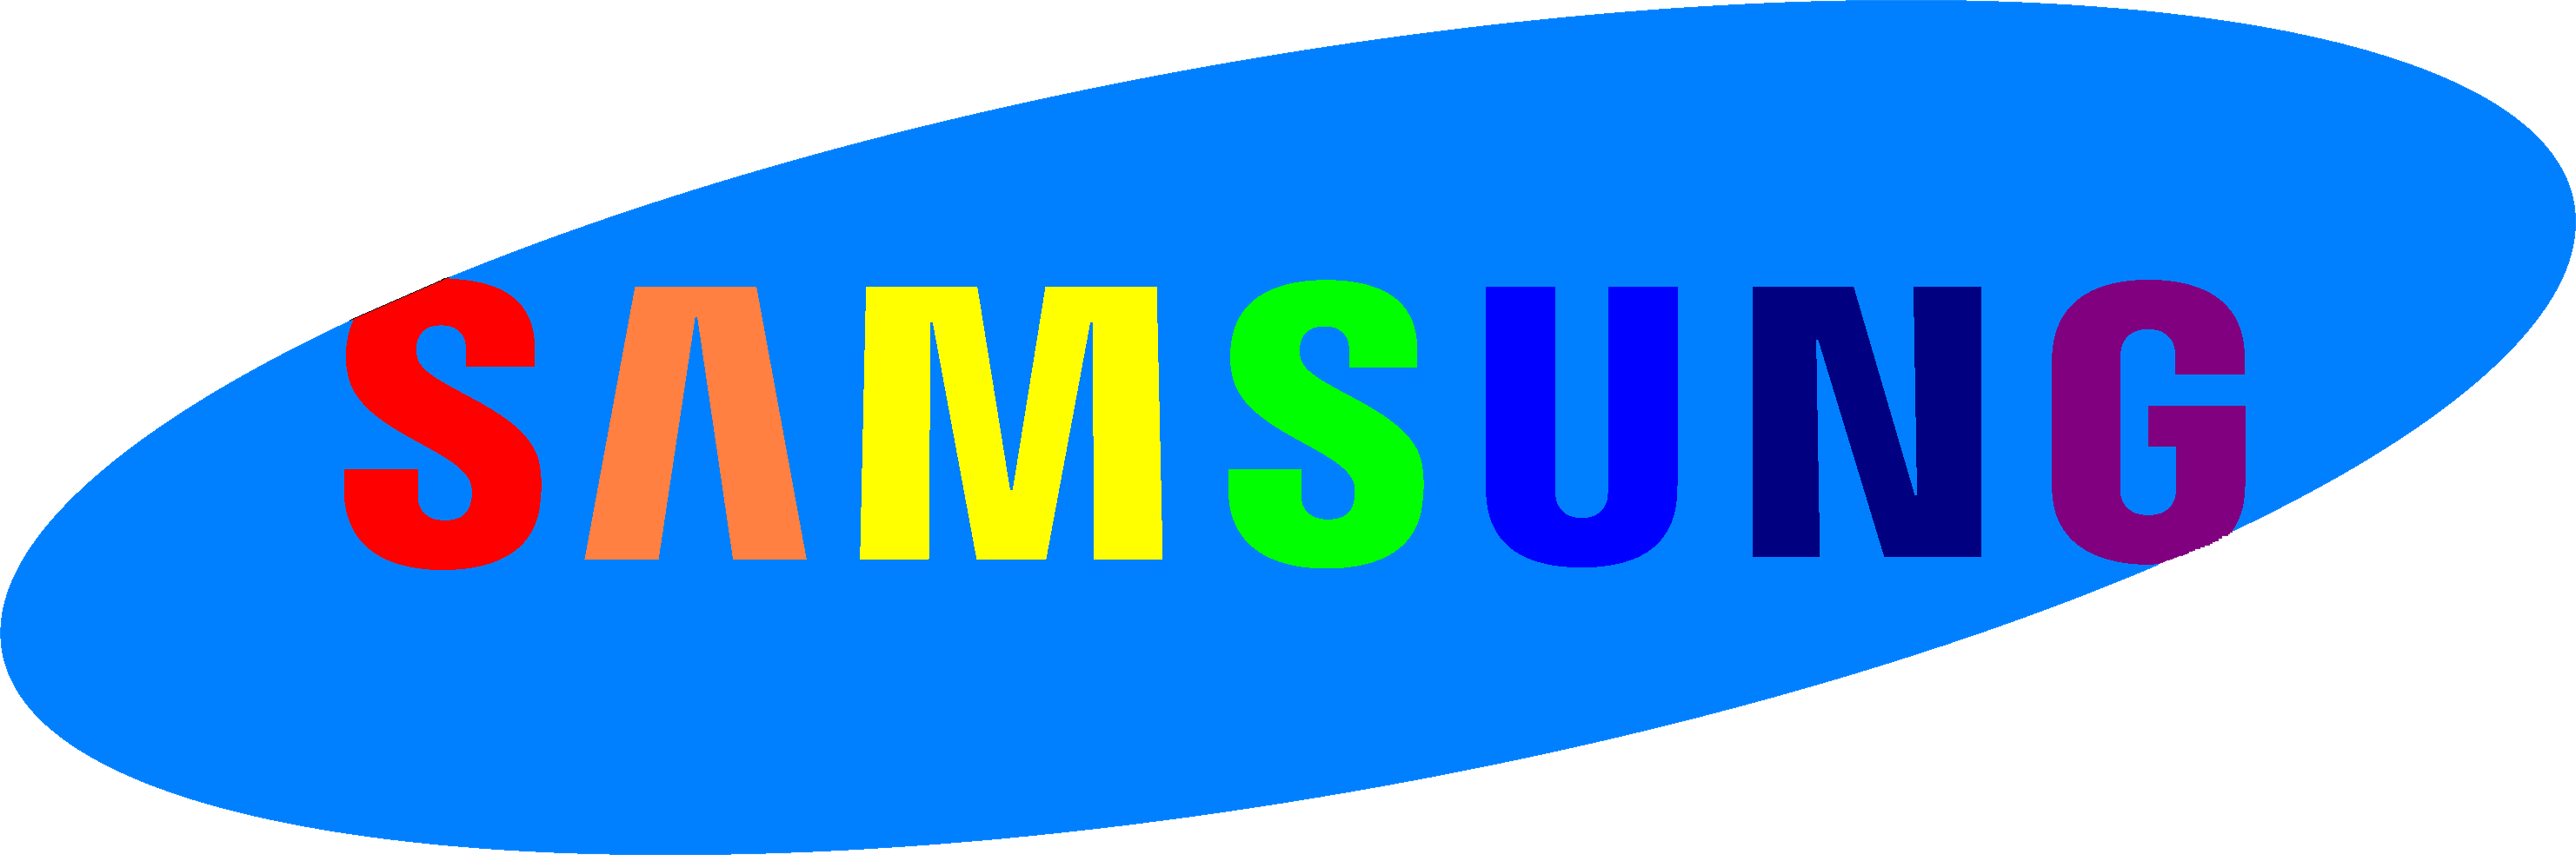 Samsung Galaxy J8 SM-J810F 8 1 Oreo Official Firmware | Mobile Flashing